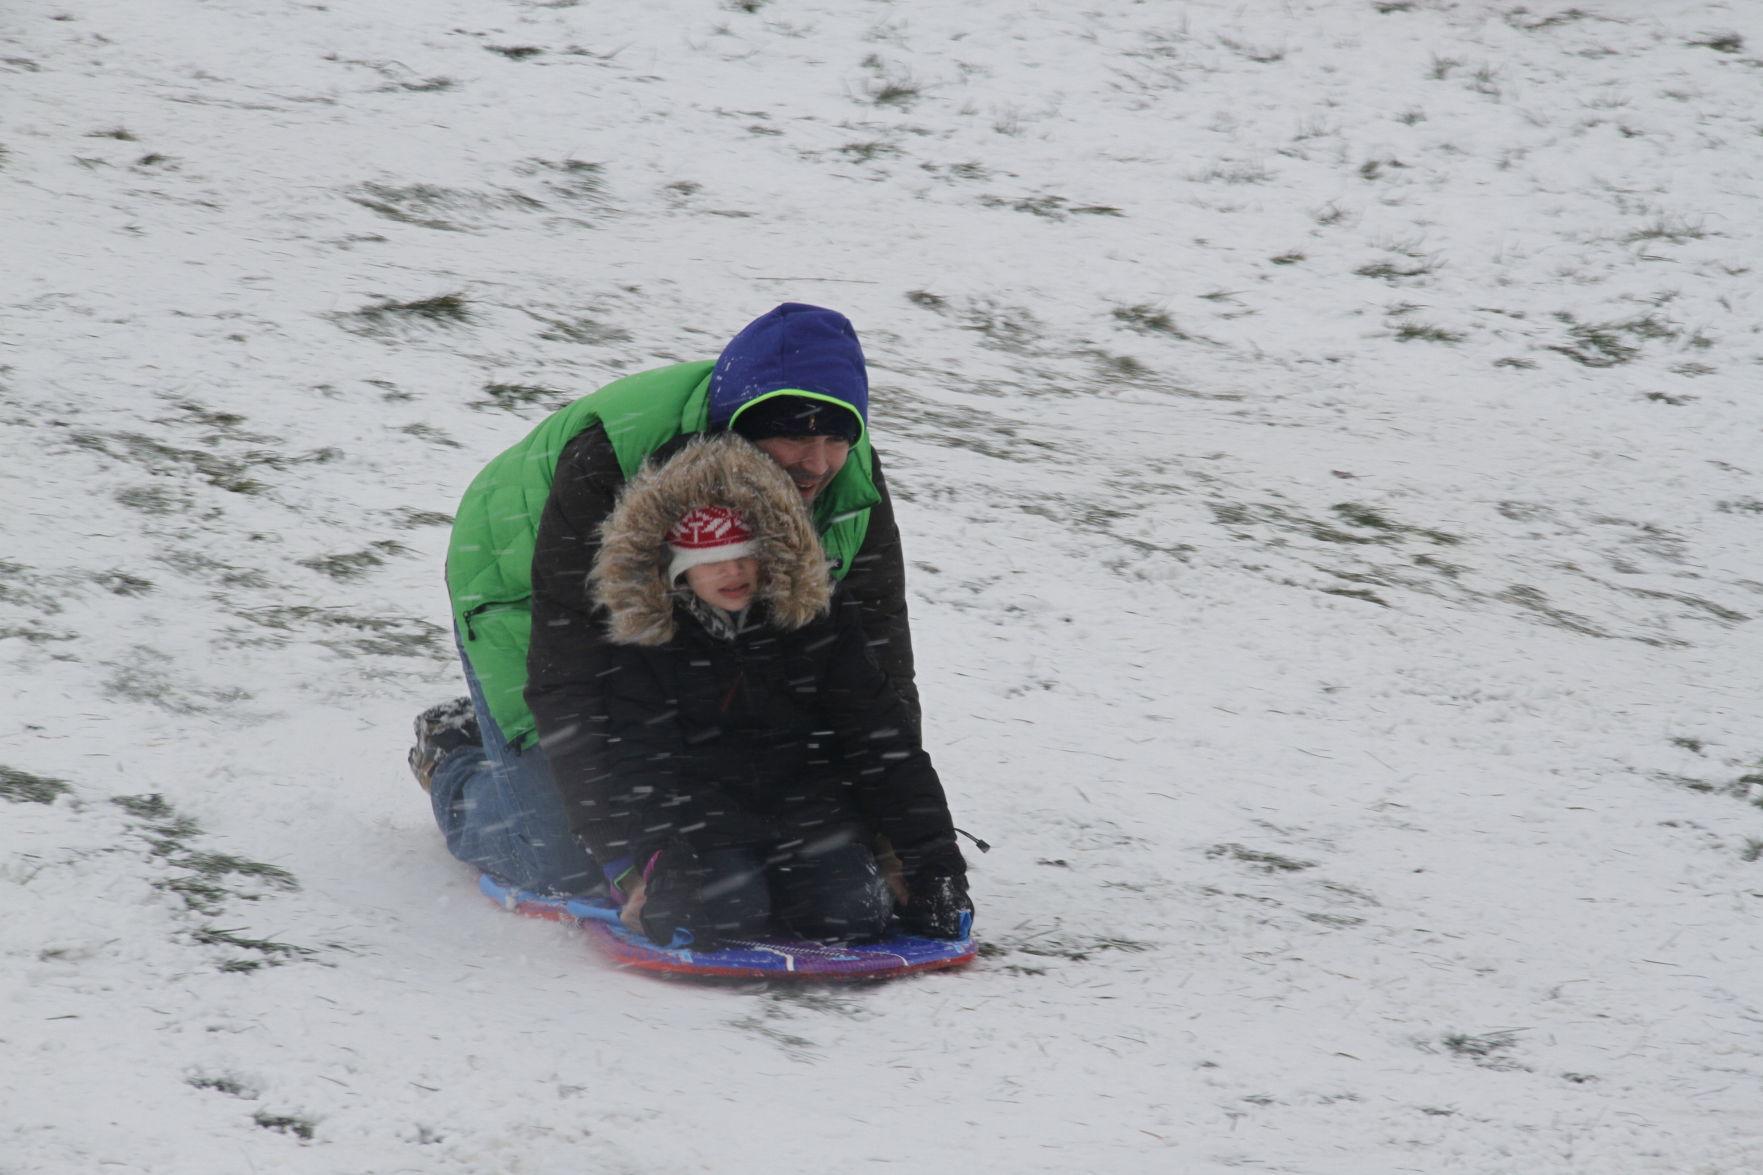 Sex while sledding